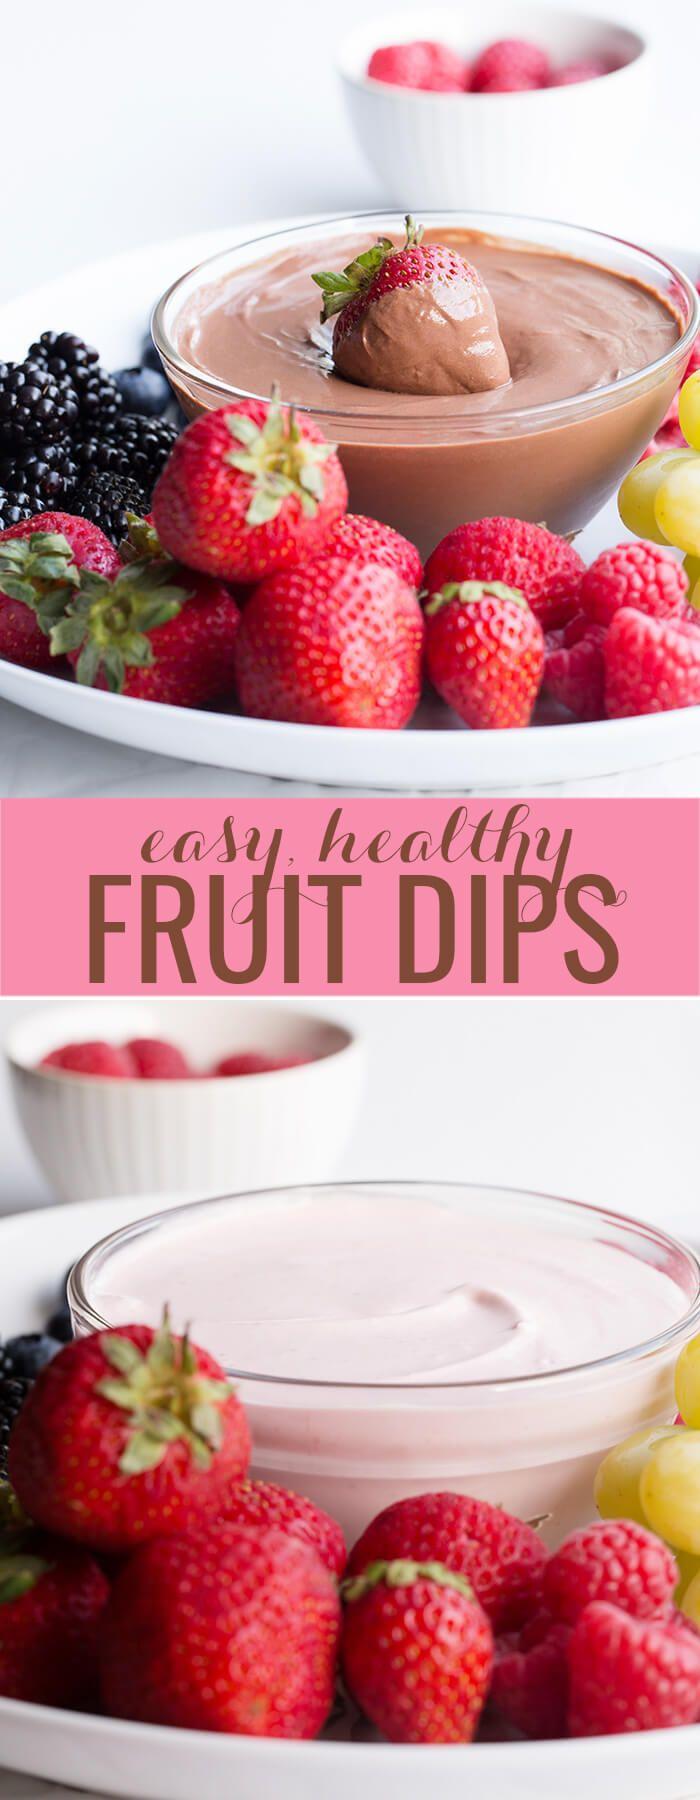 Best 25+ Healthy fruit dips ideas on Pinterest | Fruit dip yogurt ...